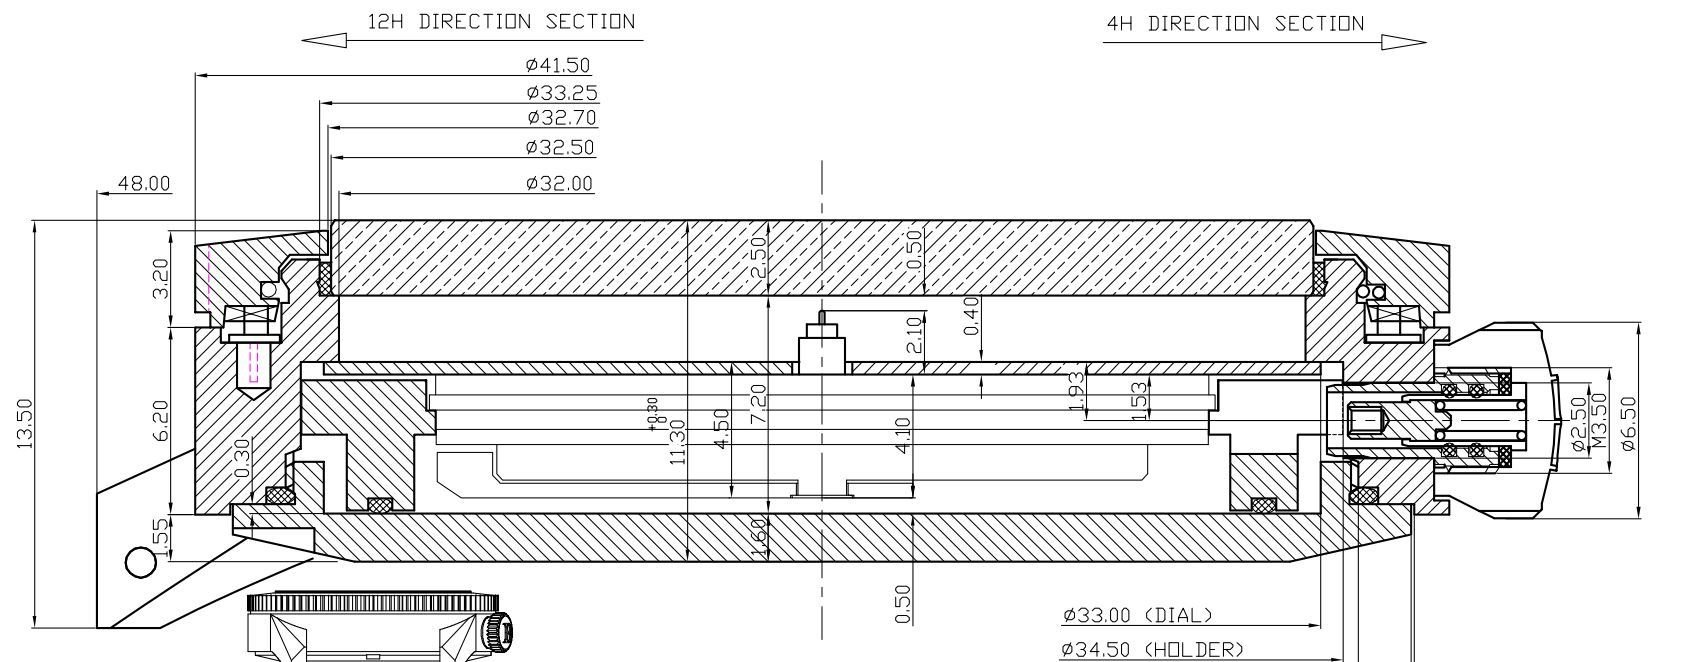 Borealis Portus Cale technical design